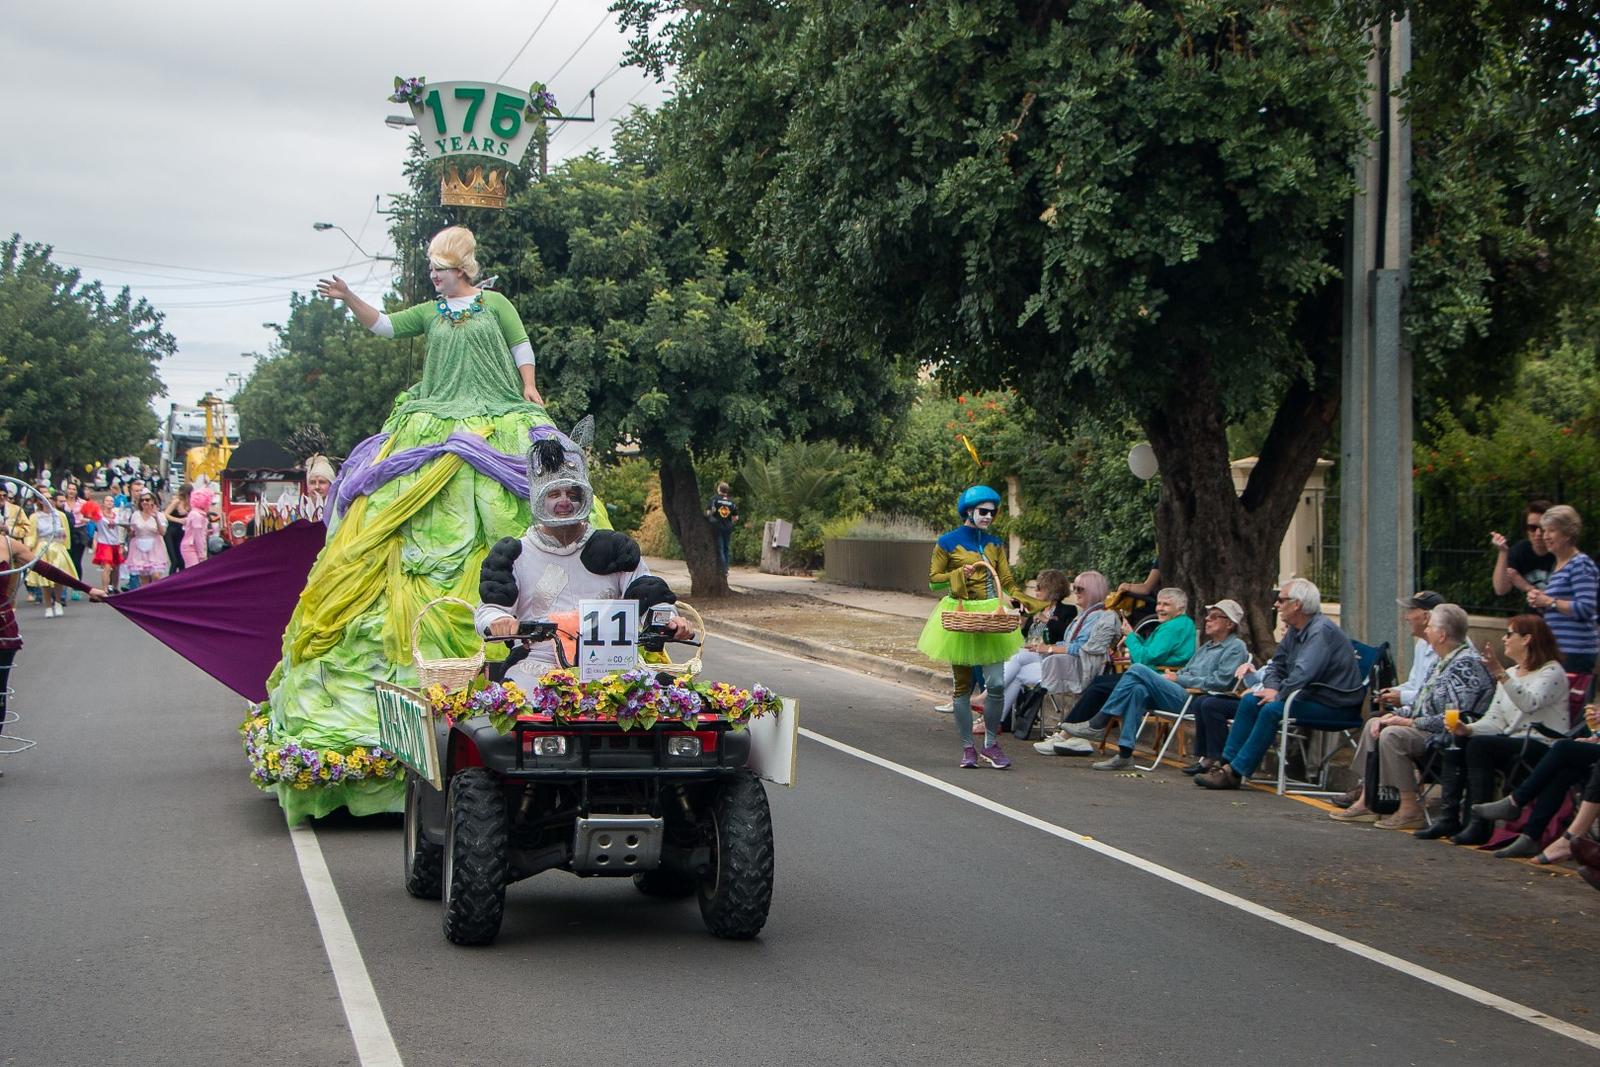 The-Parade-Nathaniel-Mason-2985